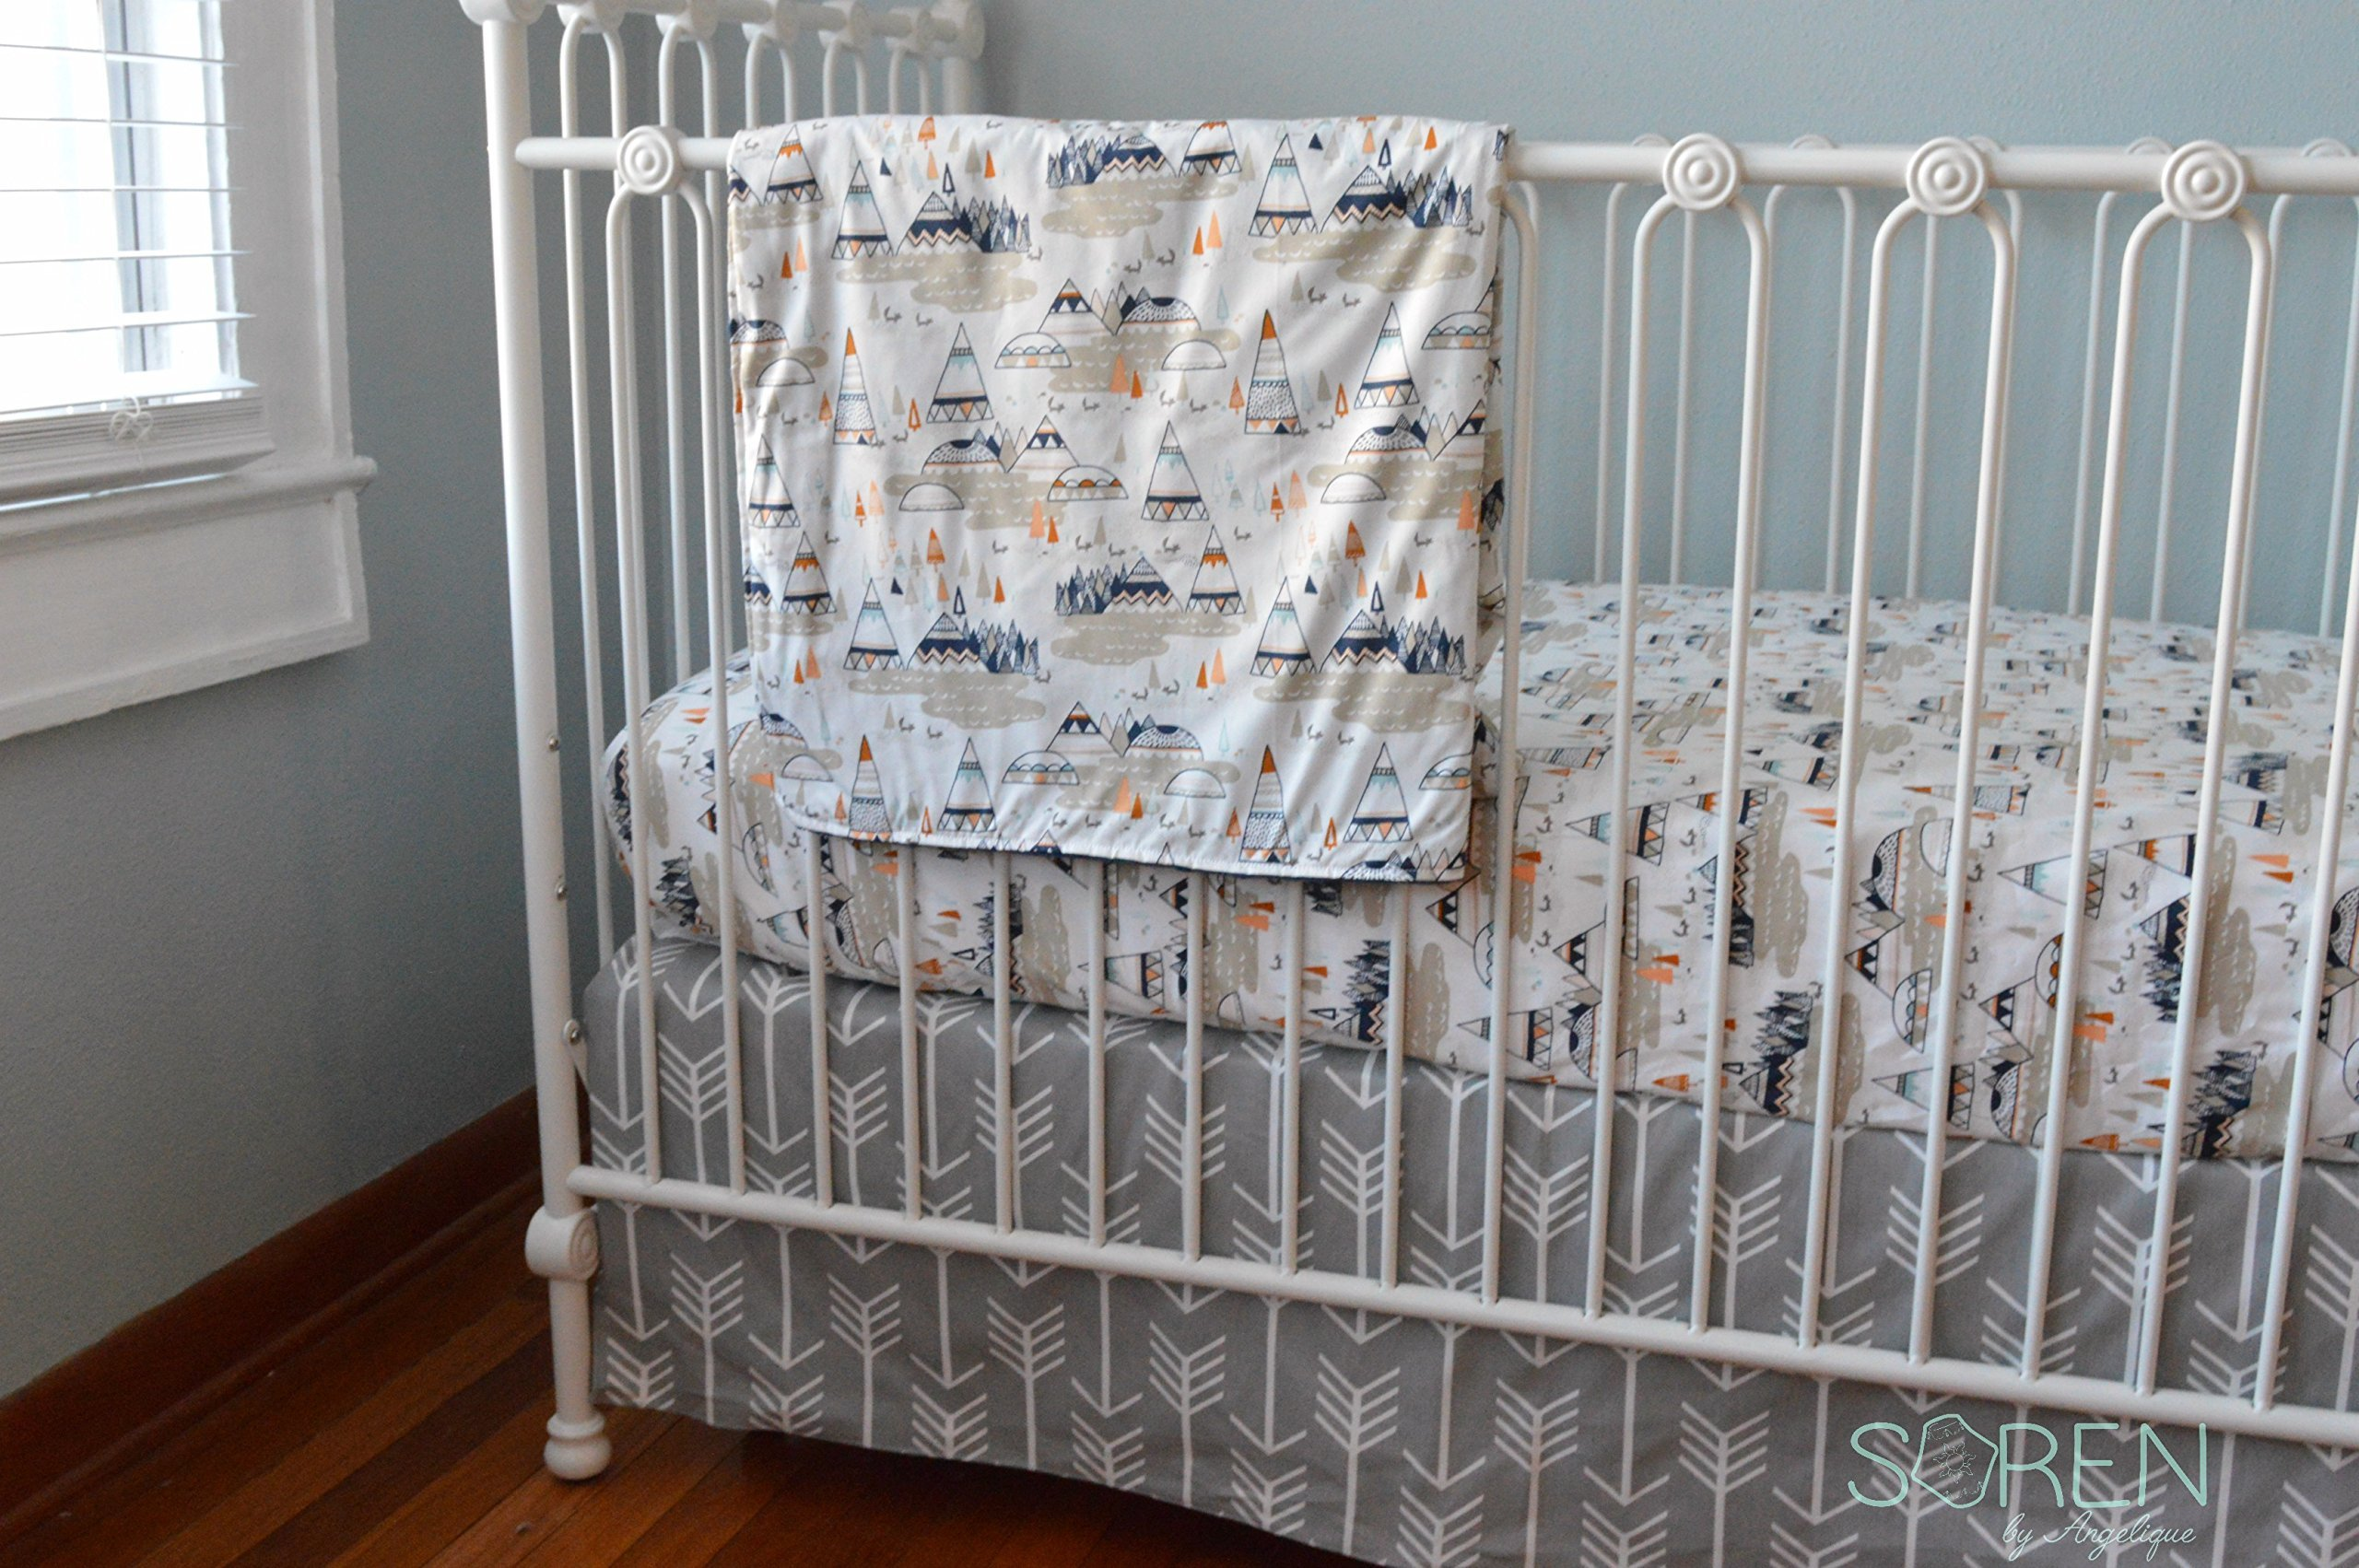 Soren by Angelique Navy Teepee 3-Piece Crib Bedding Set by Soren by Angelique